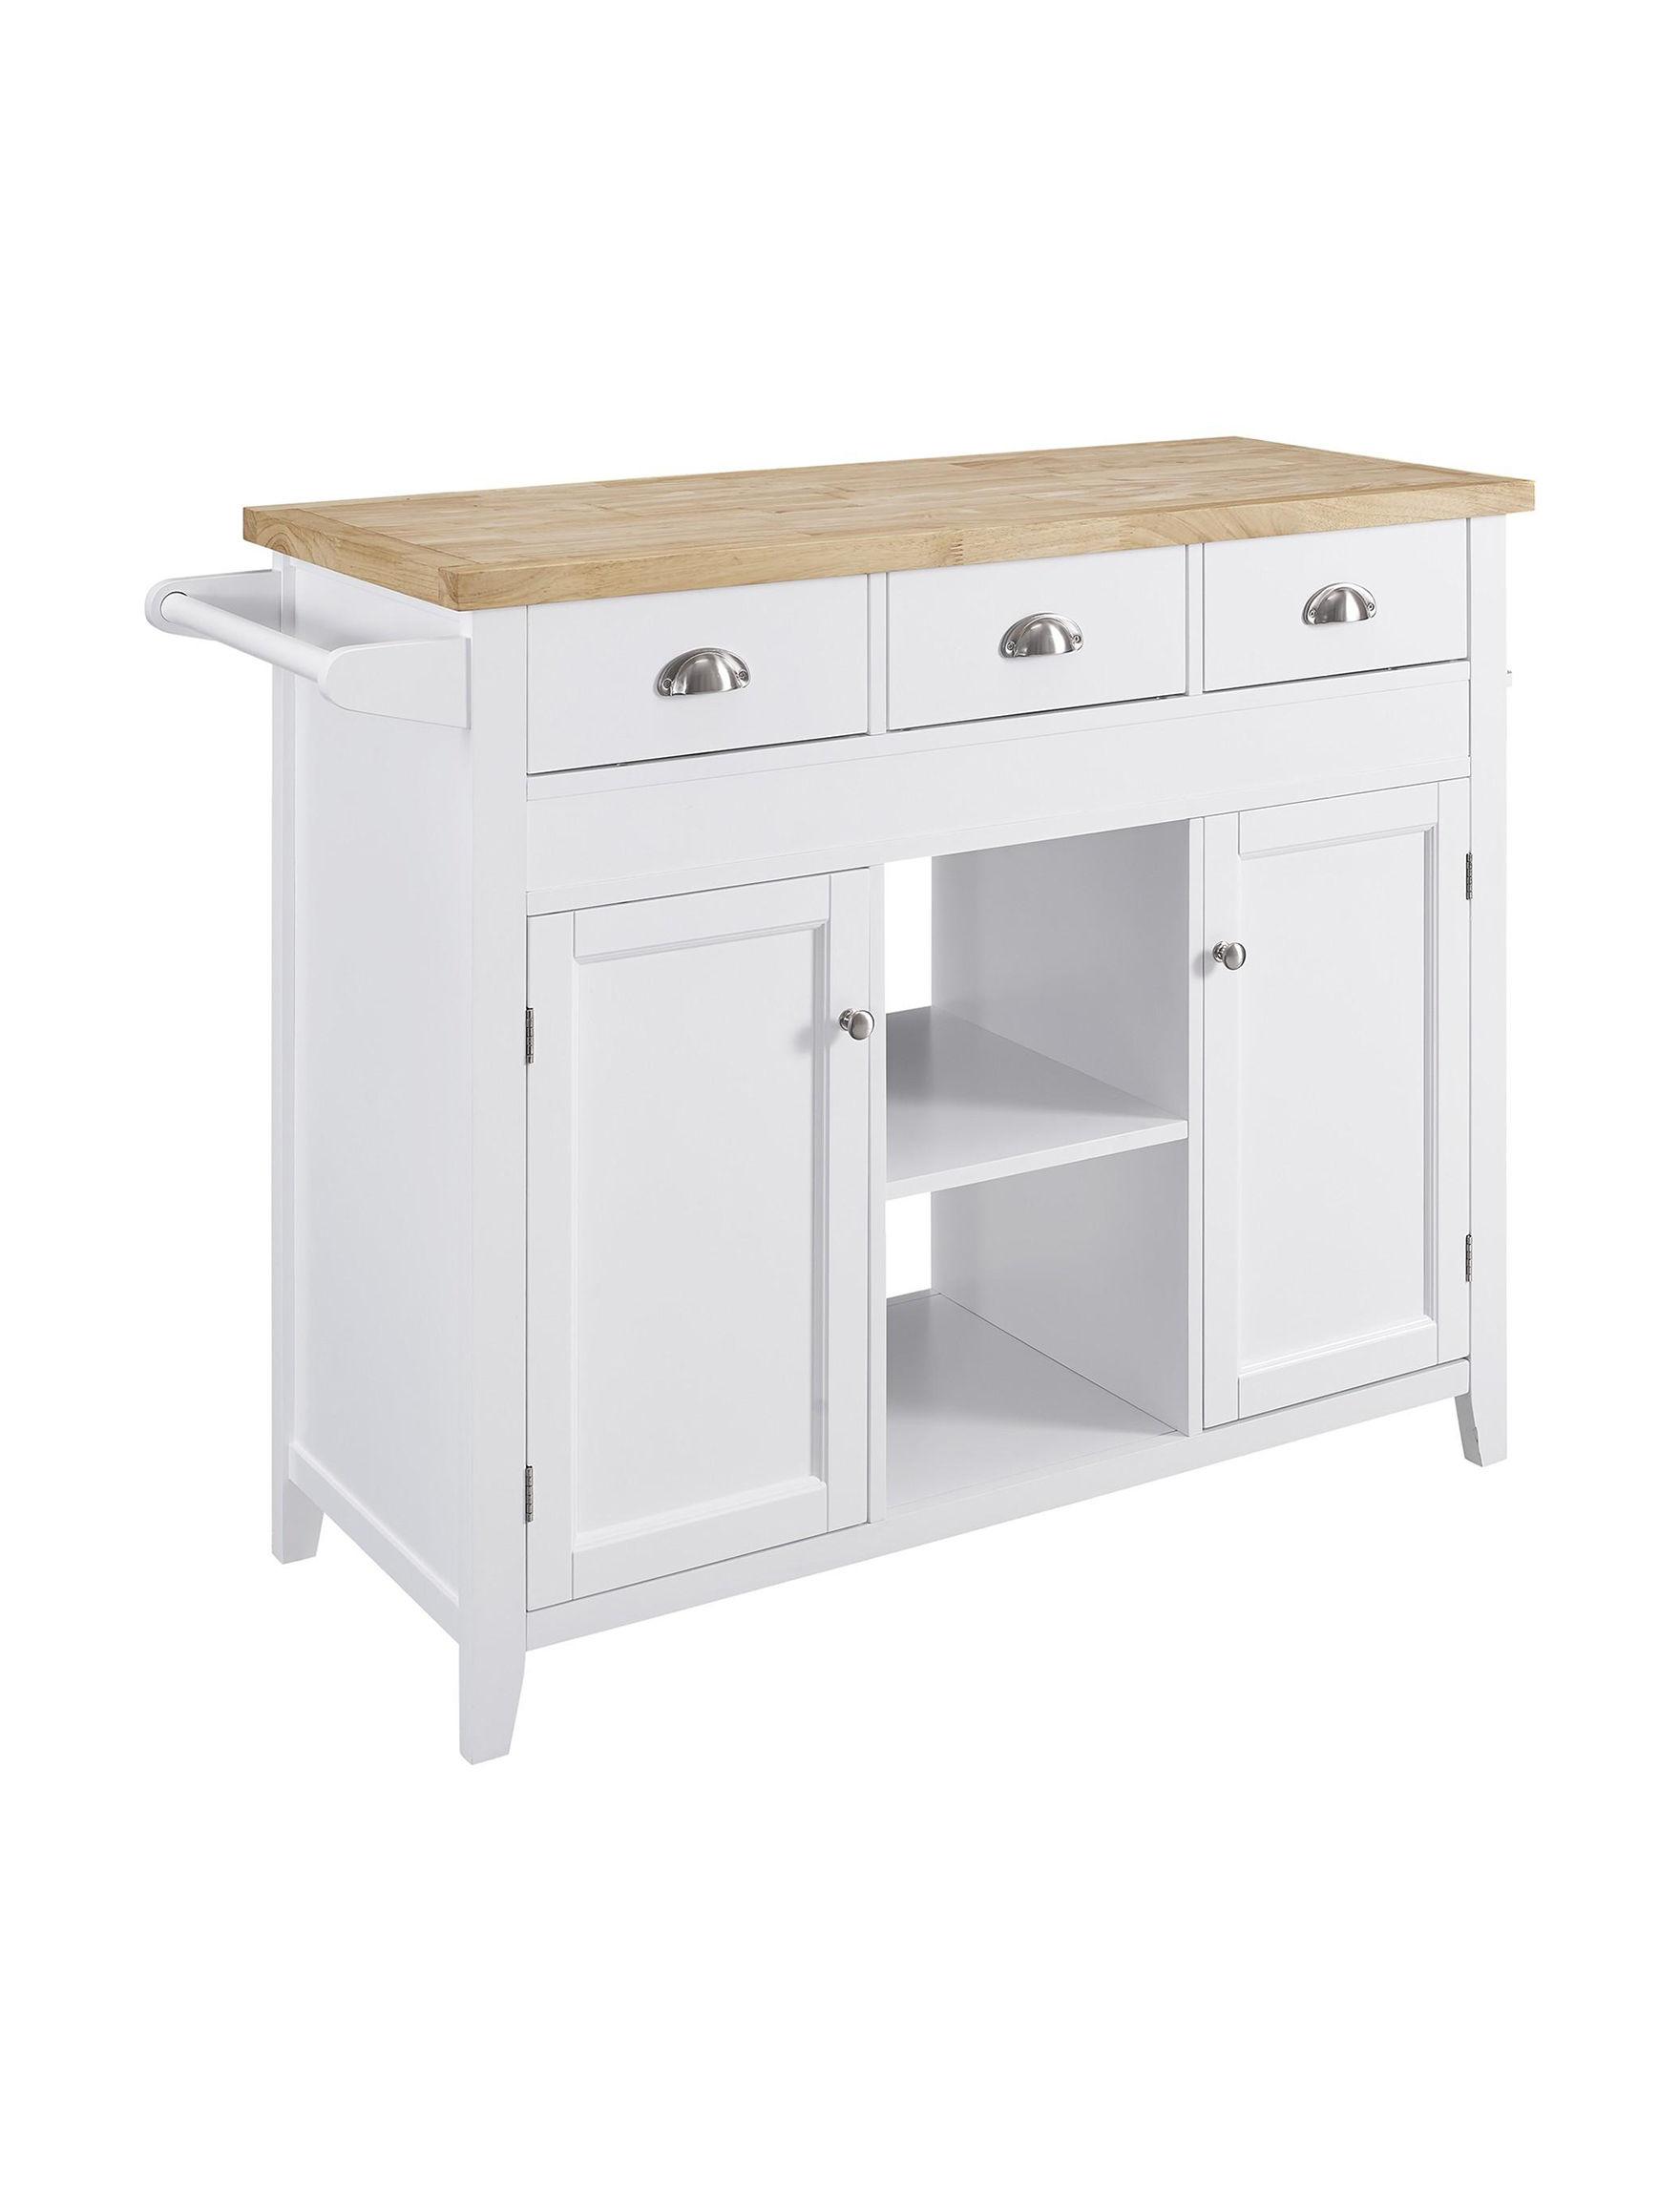 Linon White Kitchen Islands & Carts Kitchen & Dining Furniture